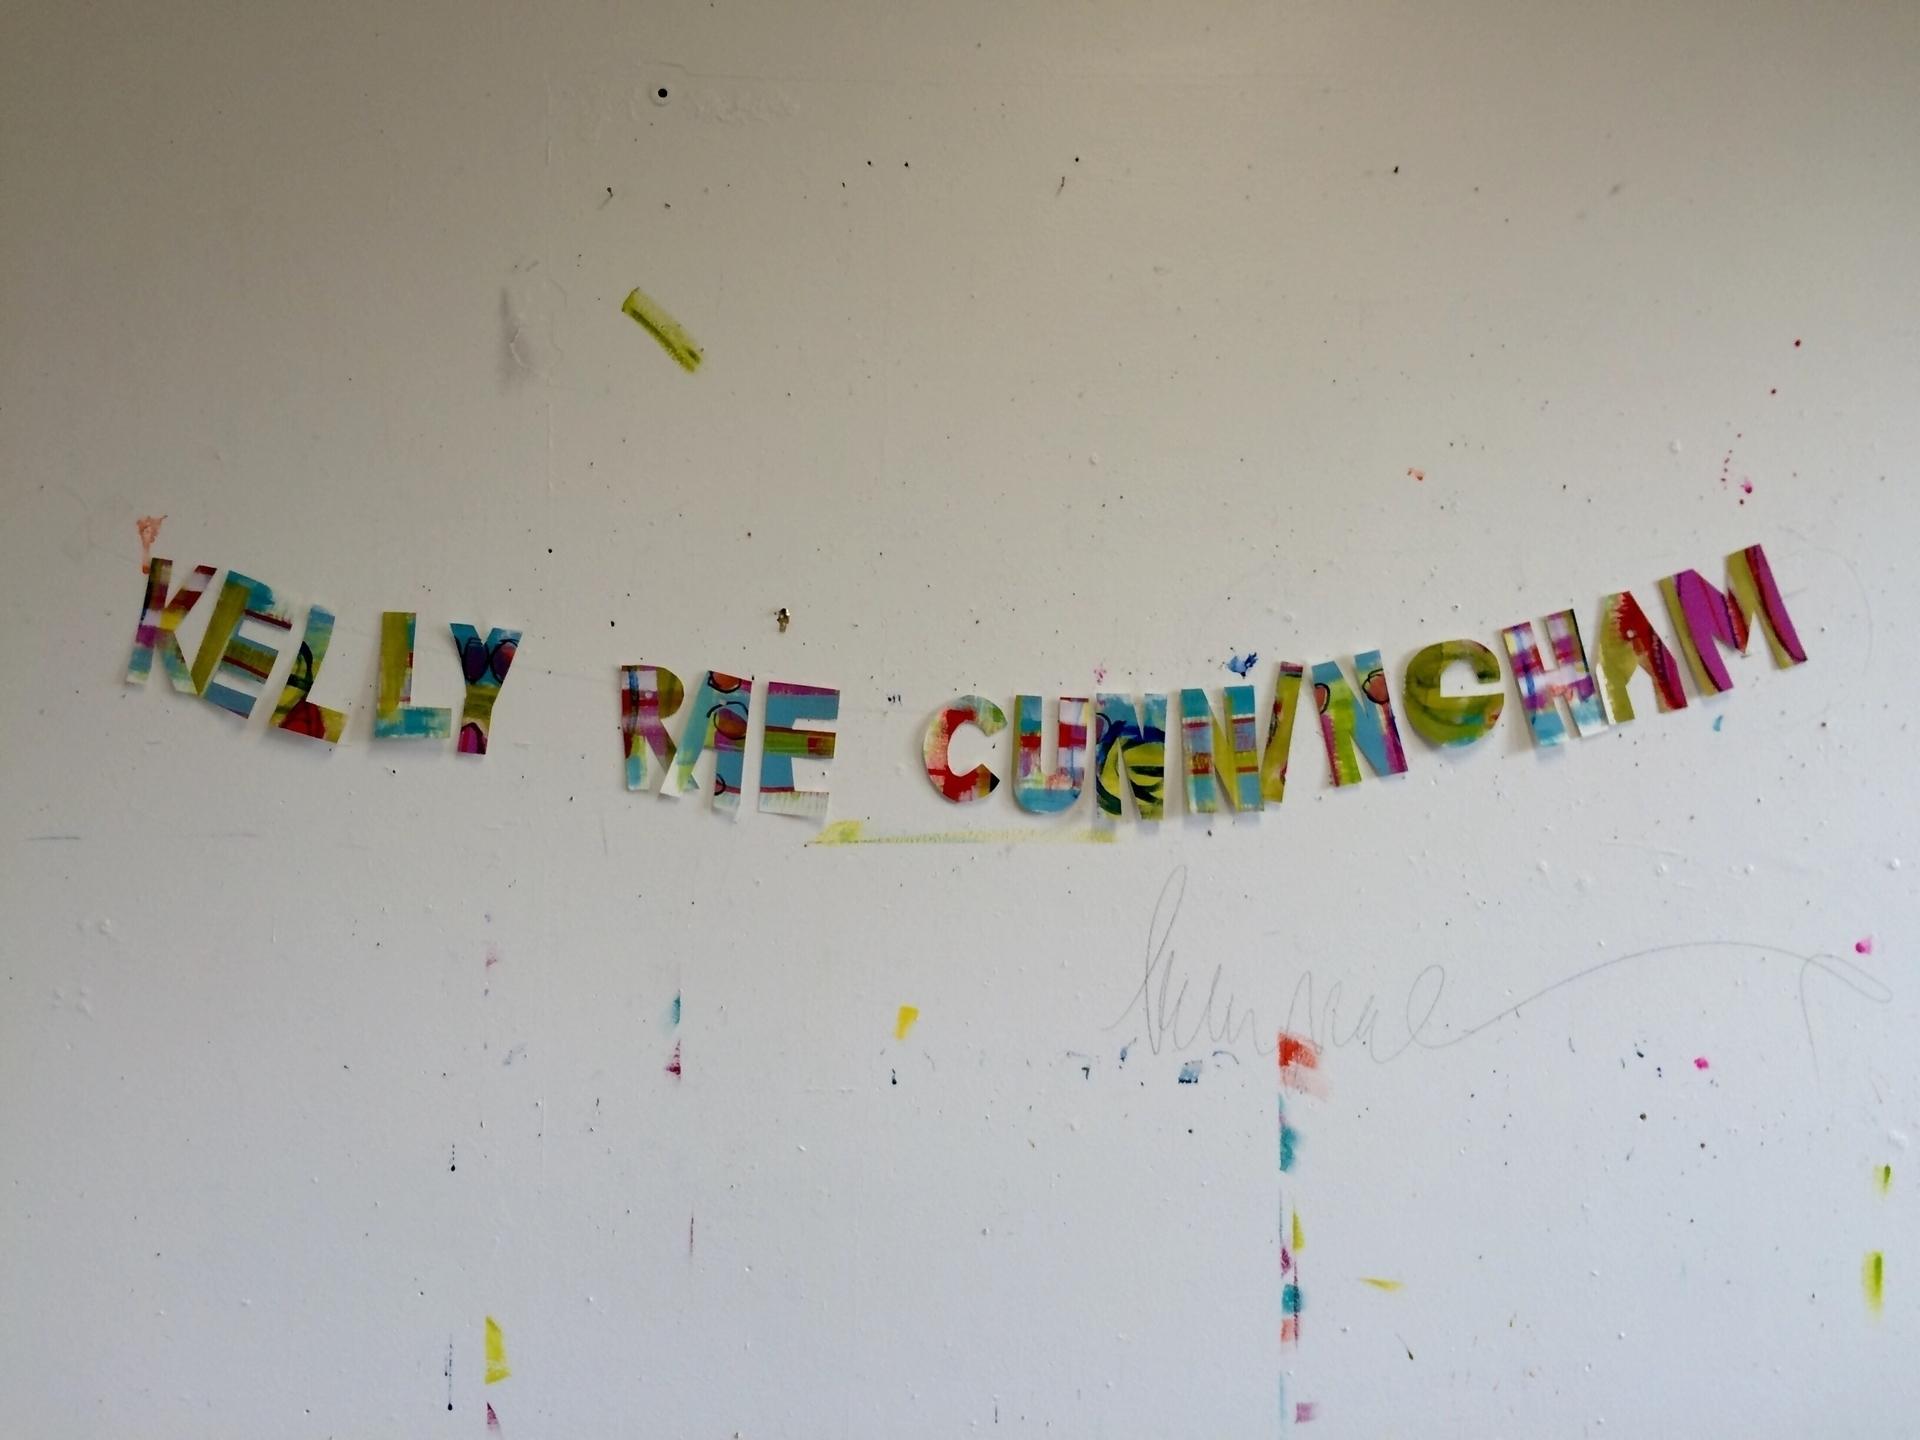 kelly rae cunningham (@kelly_rae) Cover Image